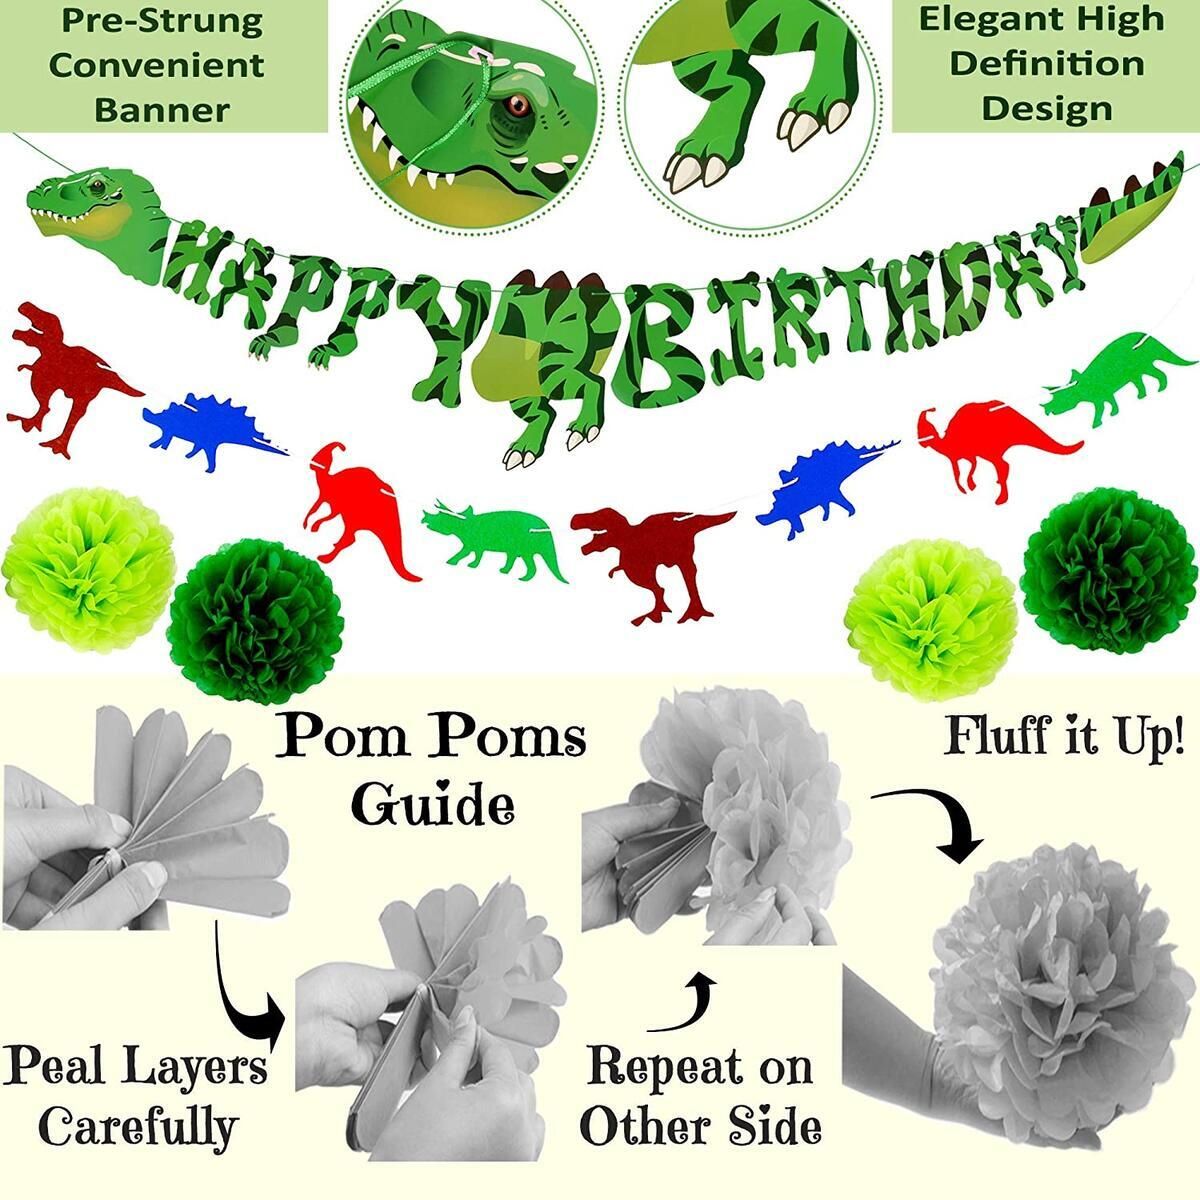 125 Pcs Dinosaur Birthday Party Supplies | Premium Mega Decorations Set Boys Girls | Balloon Arch Garland Kit, Happy Banner, TRex Palm Tree Inflatable Balloons | Dino Jungle Animal Jurassic Theme